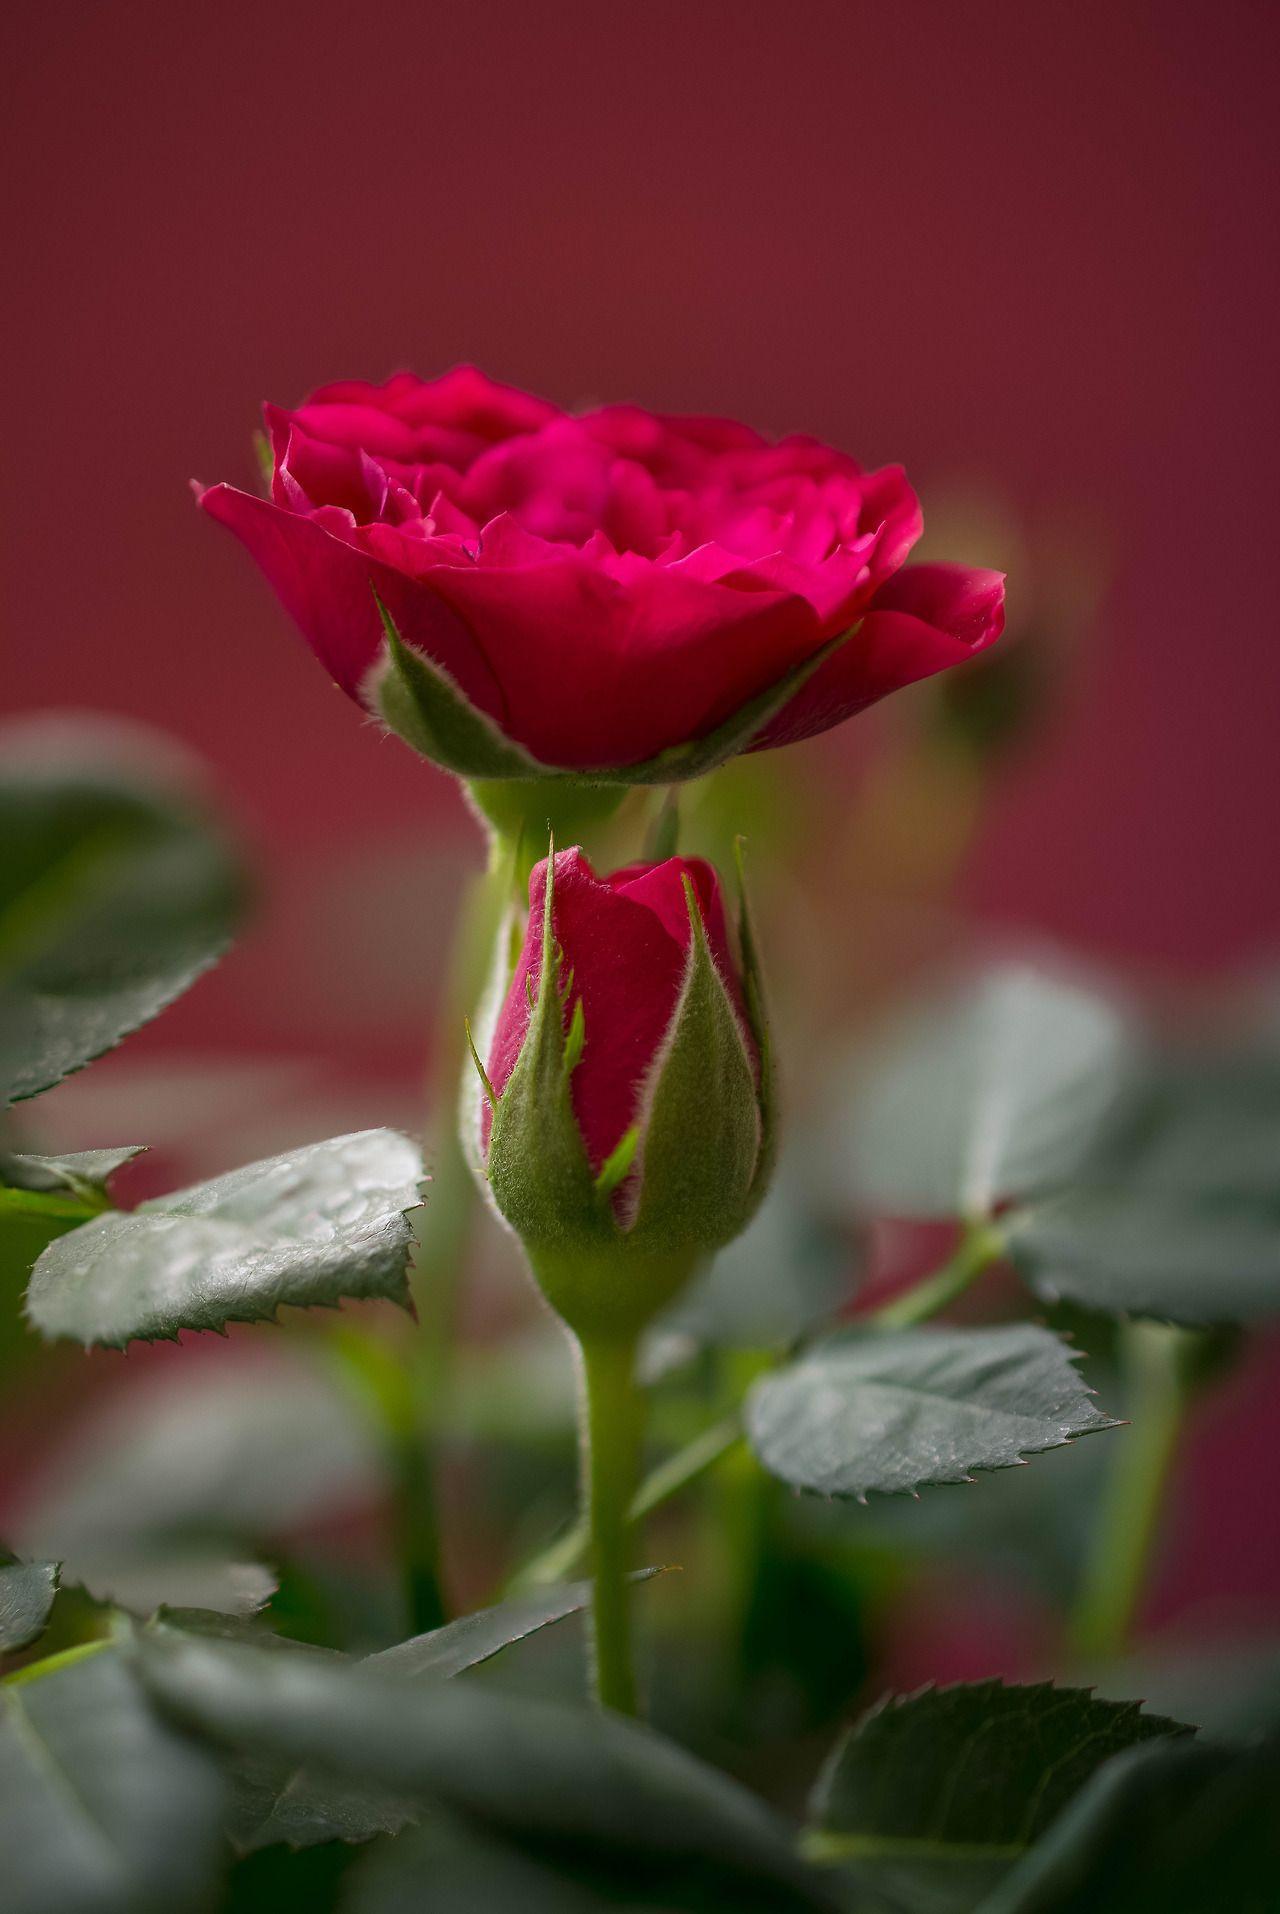 Pin by Rosalen Pastrana on Rosas rojas   Pinterest   Flowers